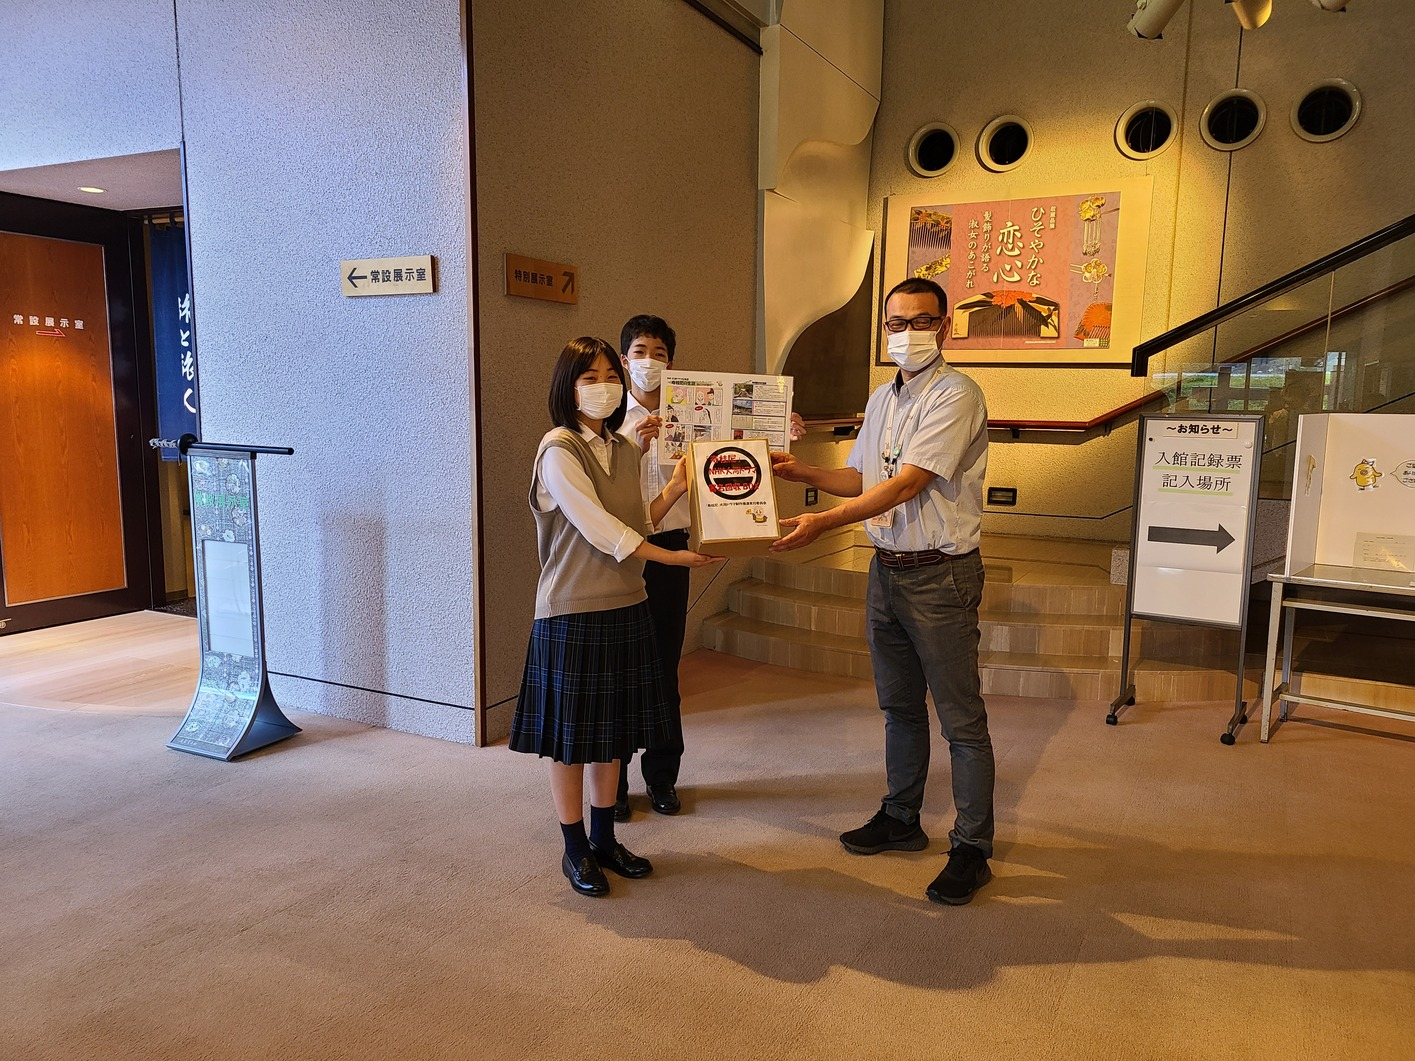 2年生「地方創生研究活動」島田市博物館で大河ドラマ誘致活動!